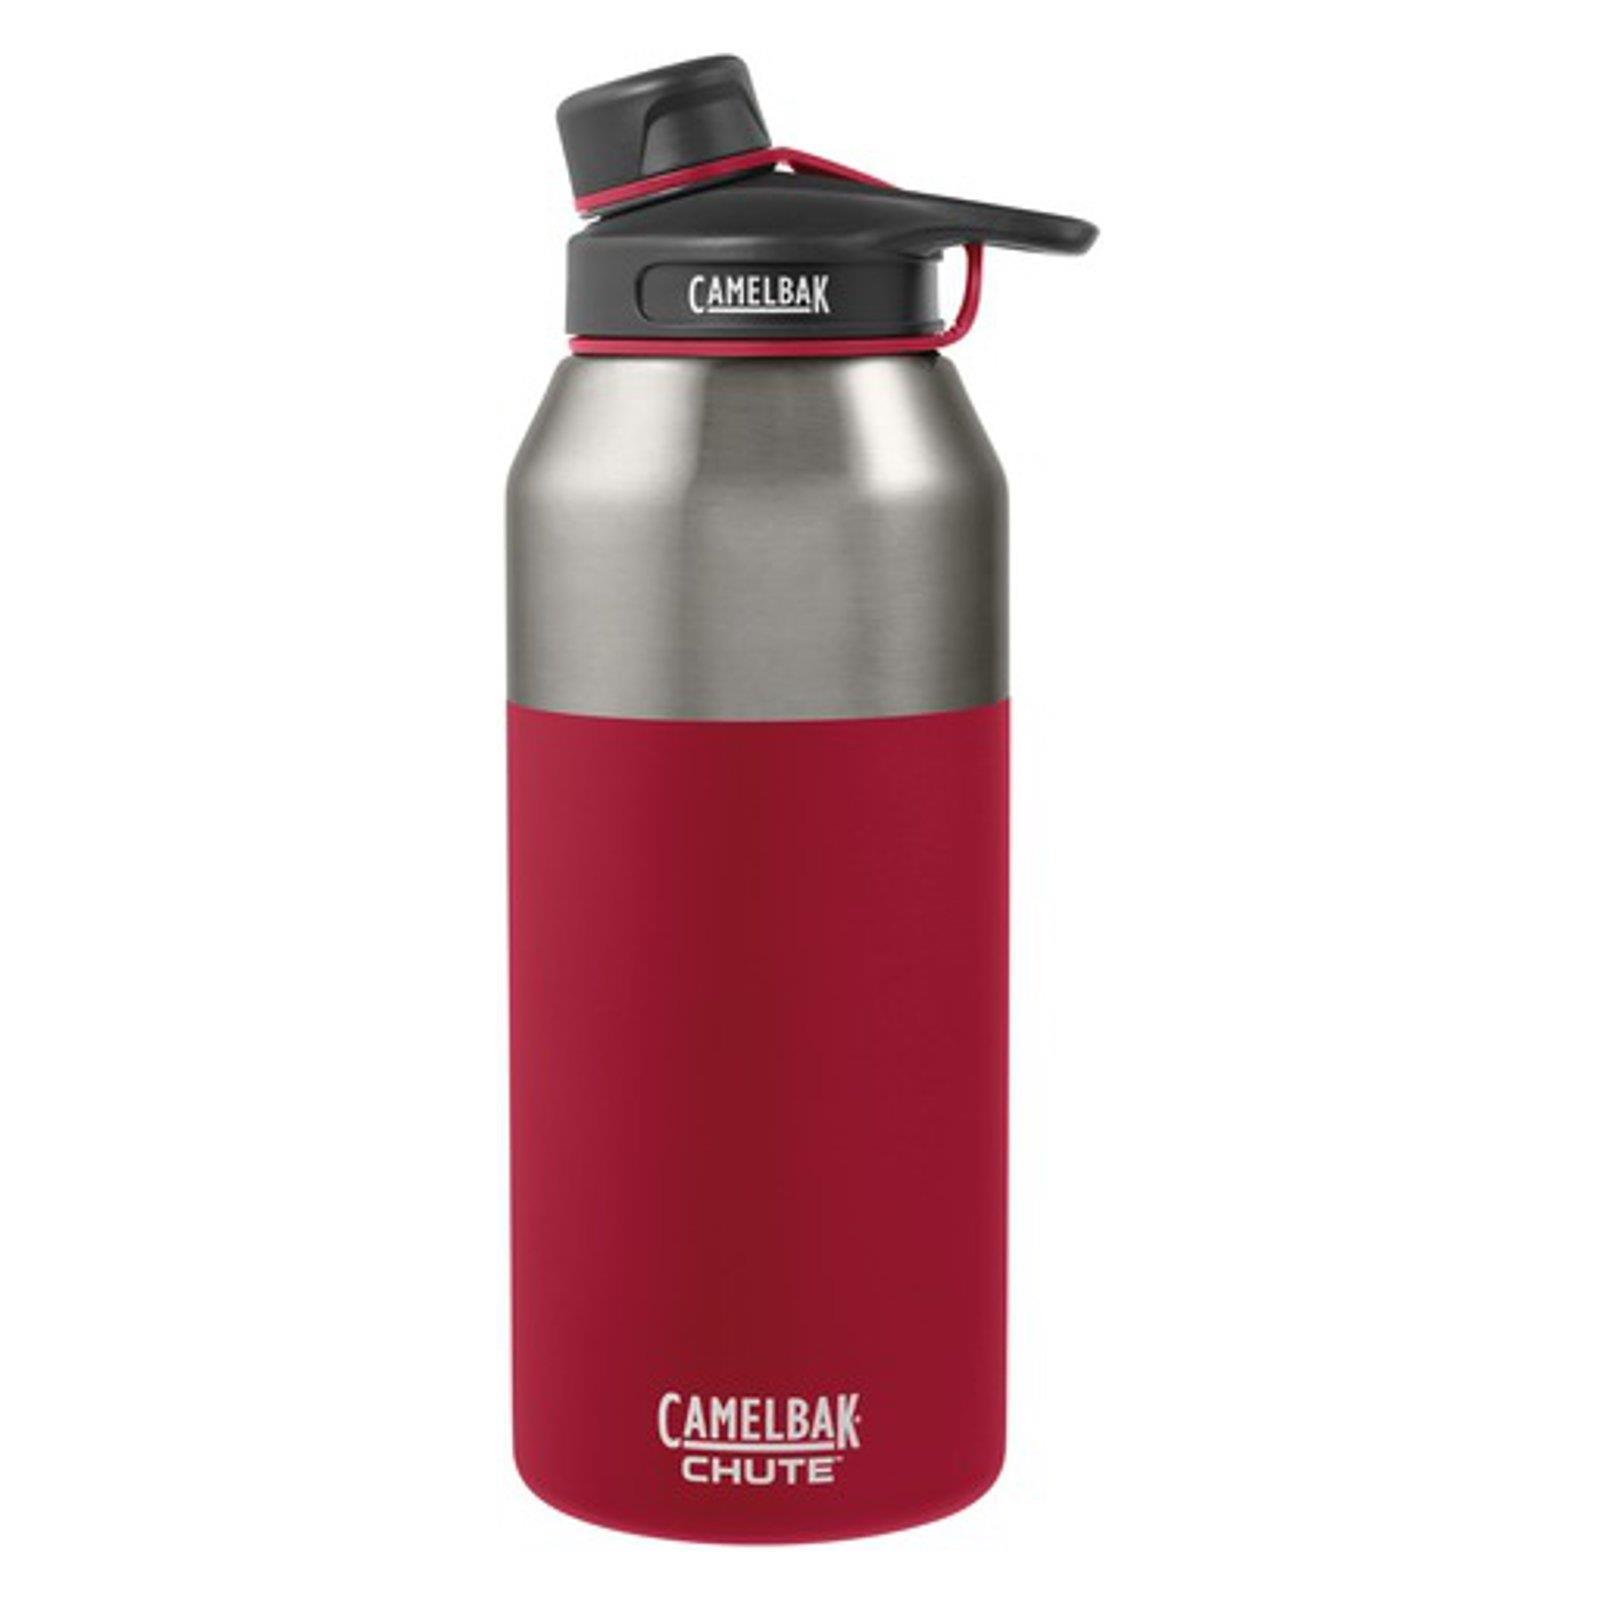 Camelbak-Trink-Isolier-Flasche-Chute-Vacuum-Thermo-Becher-Kanne-Outdoor Indexbild 17